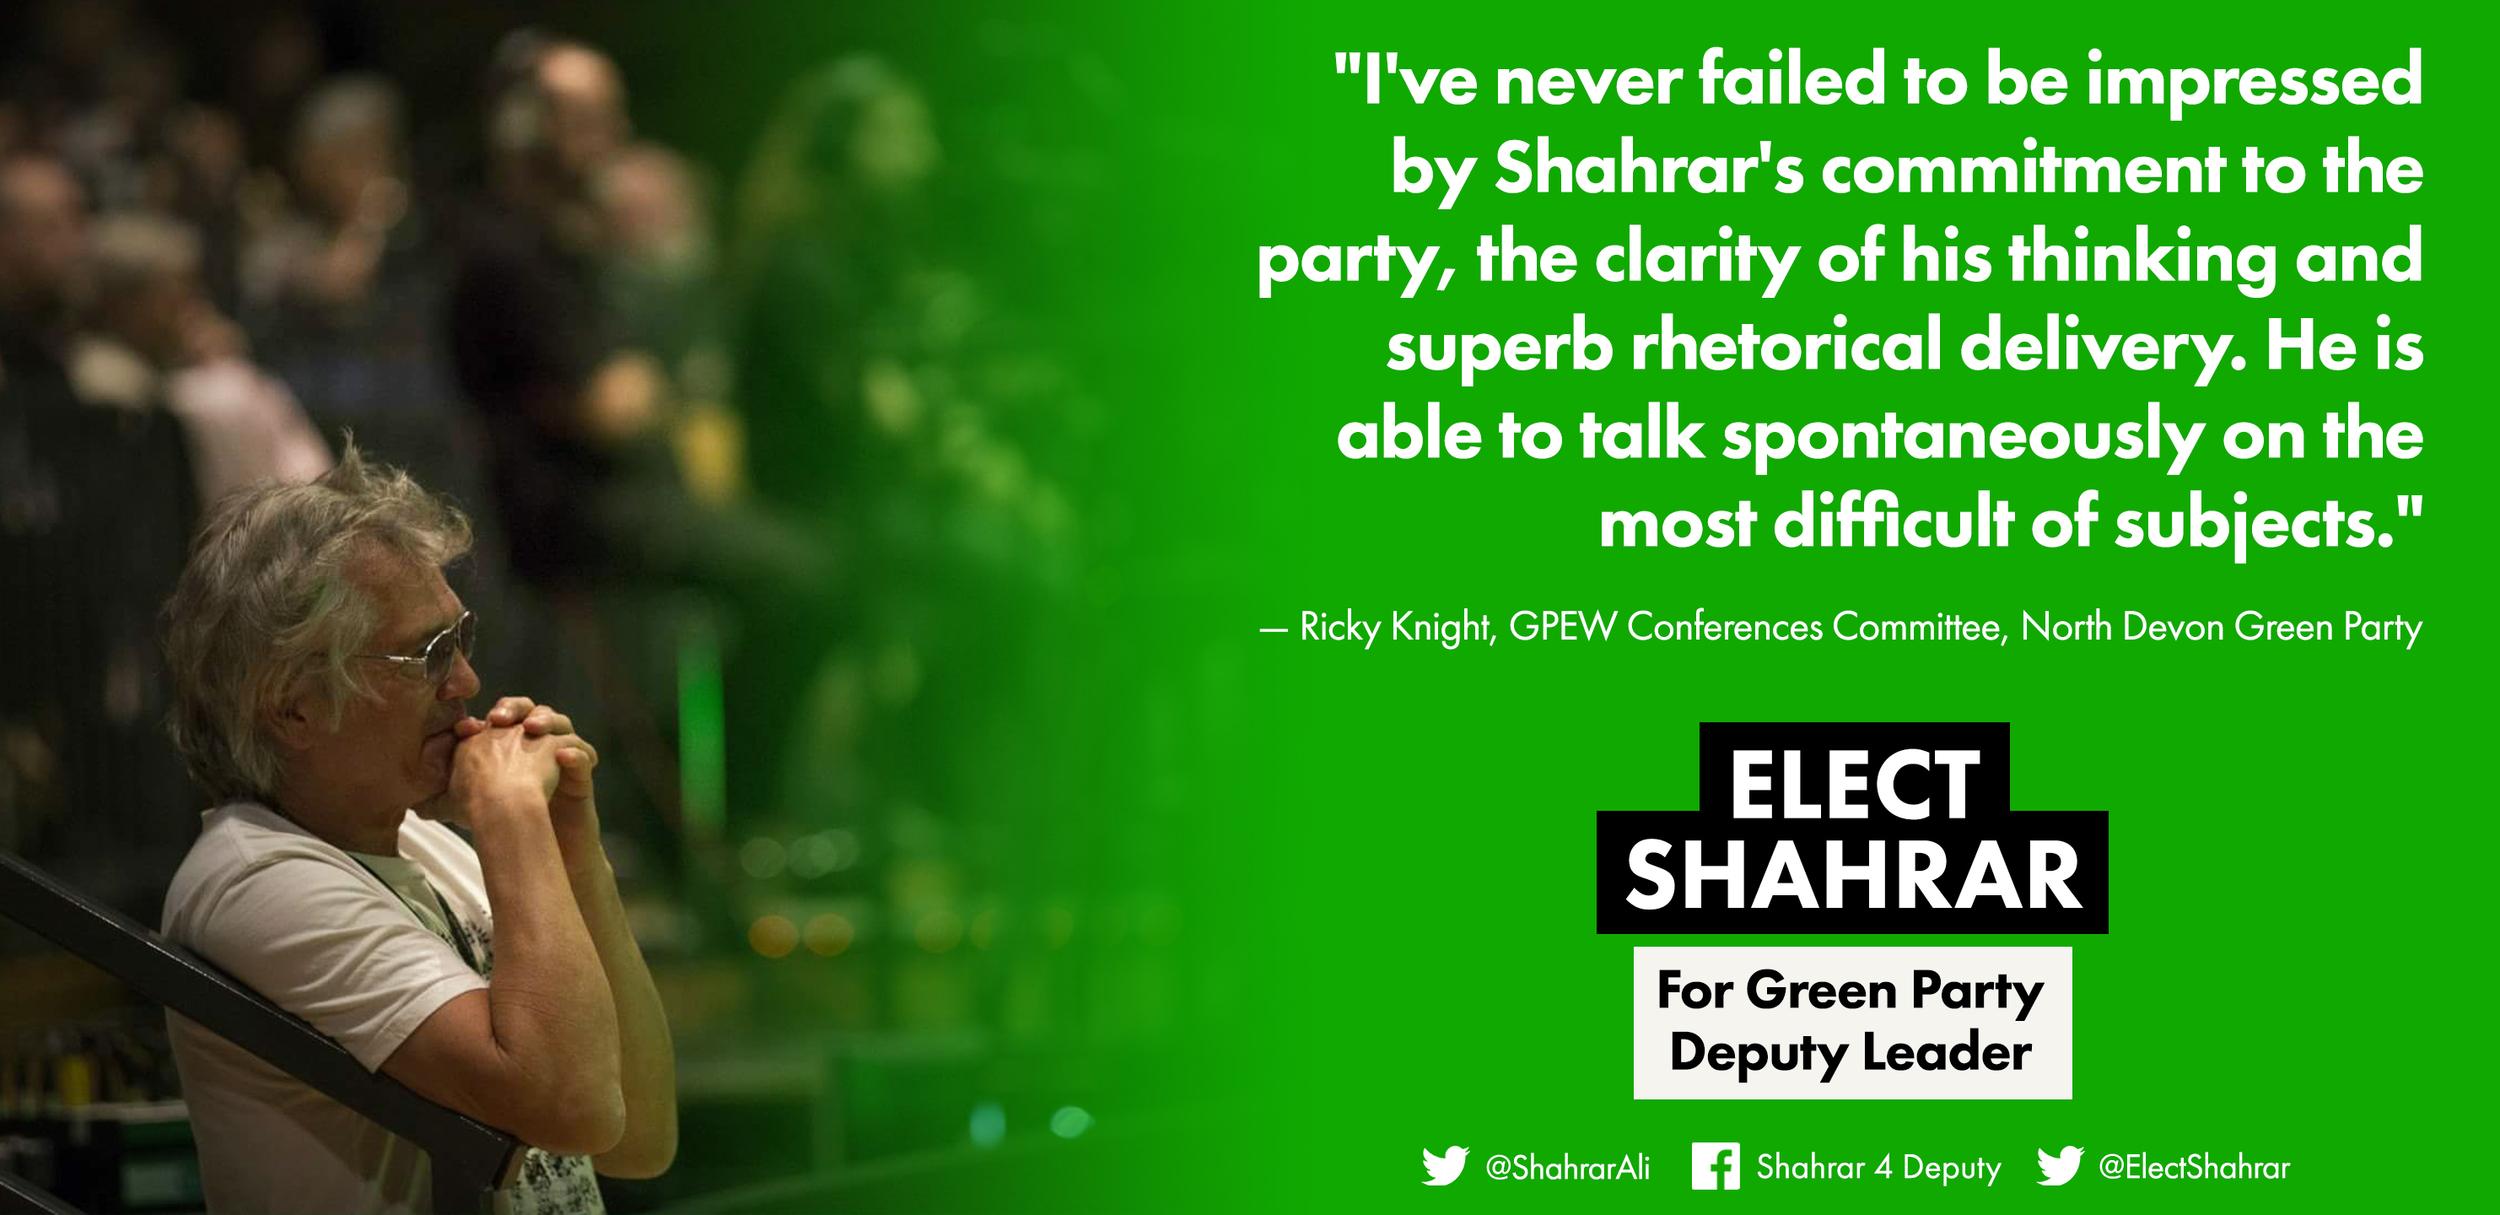 Elect Shahrar Richard Knight Endorsement.jpg